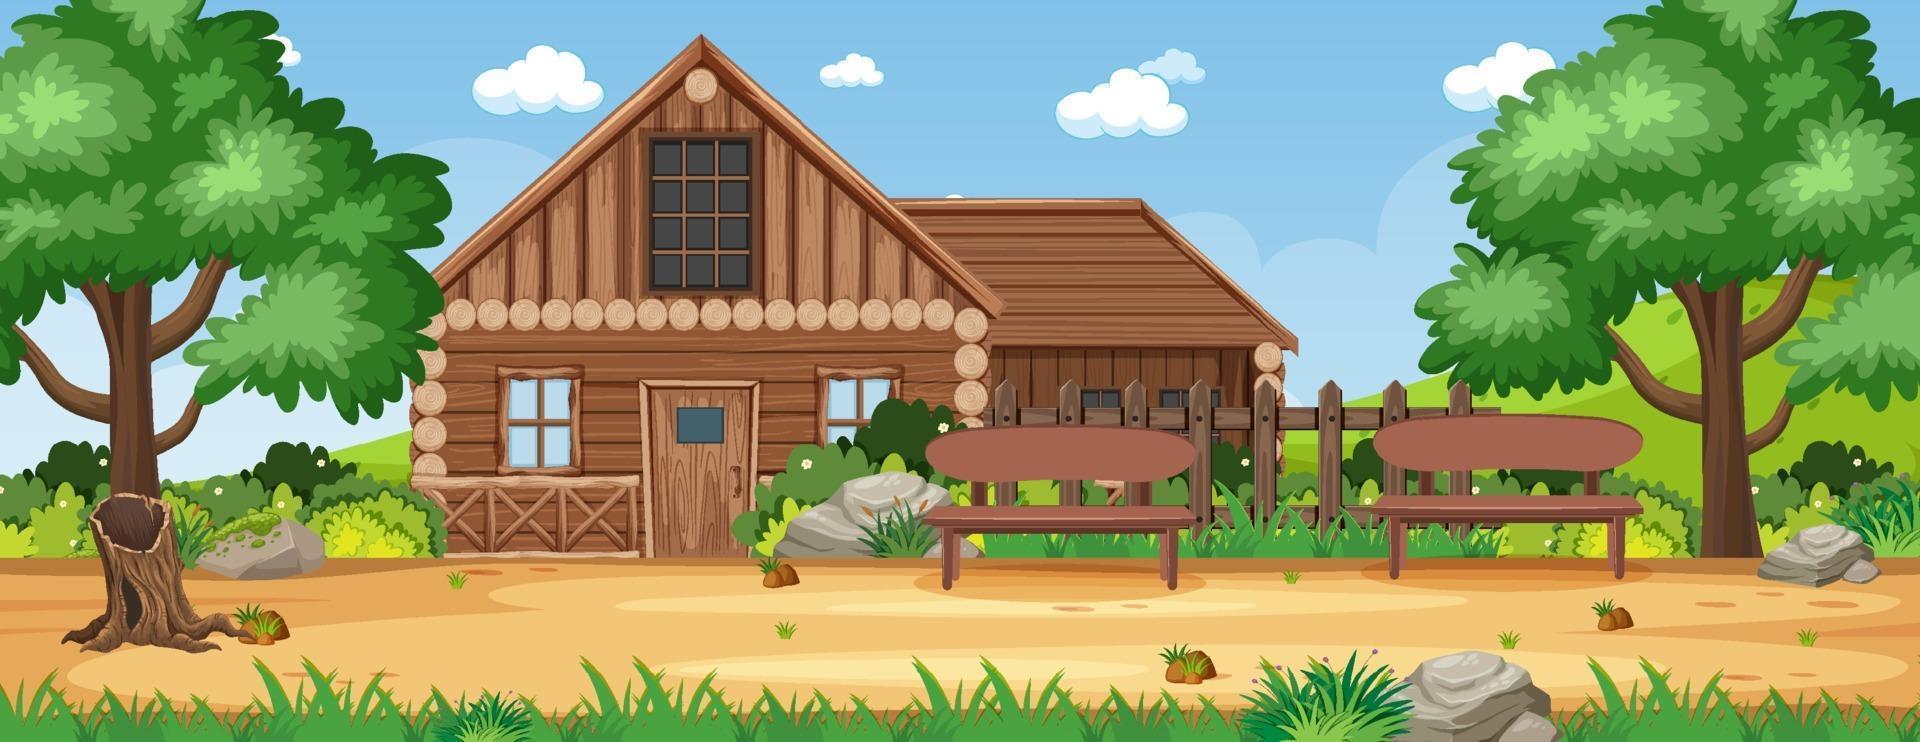 landsbygdens hemlandskap vektor